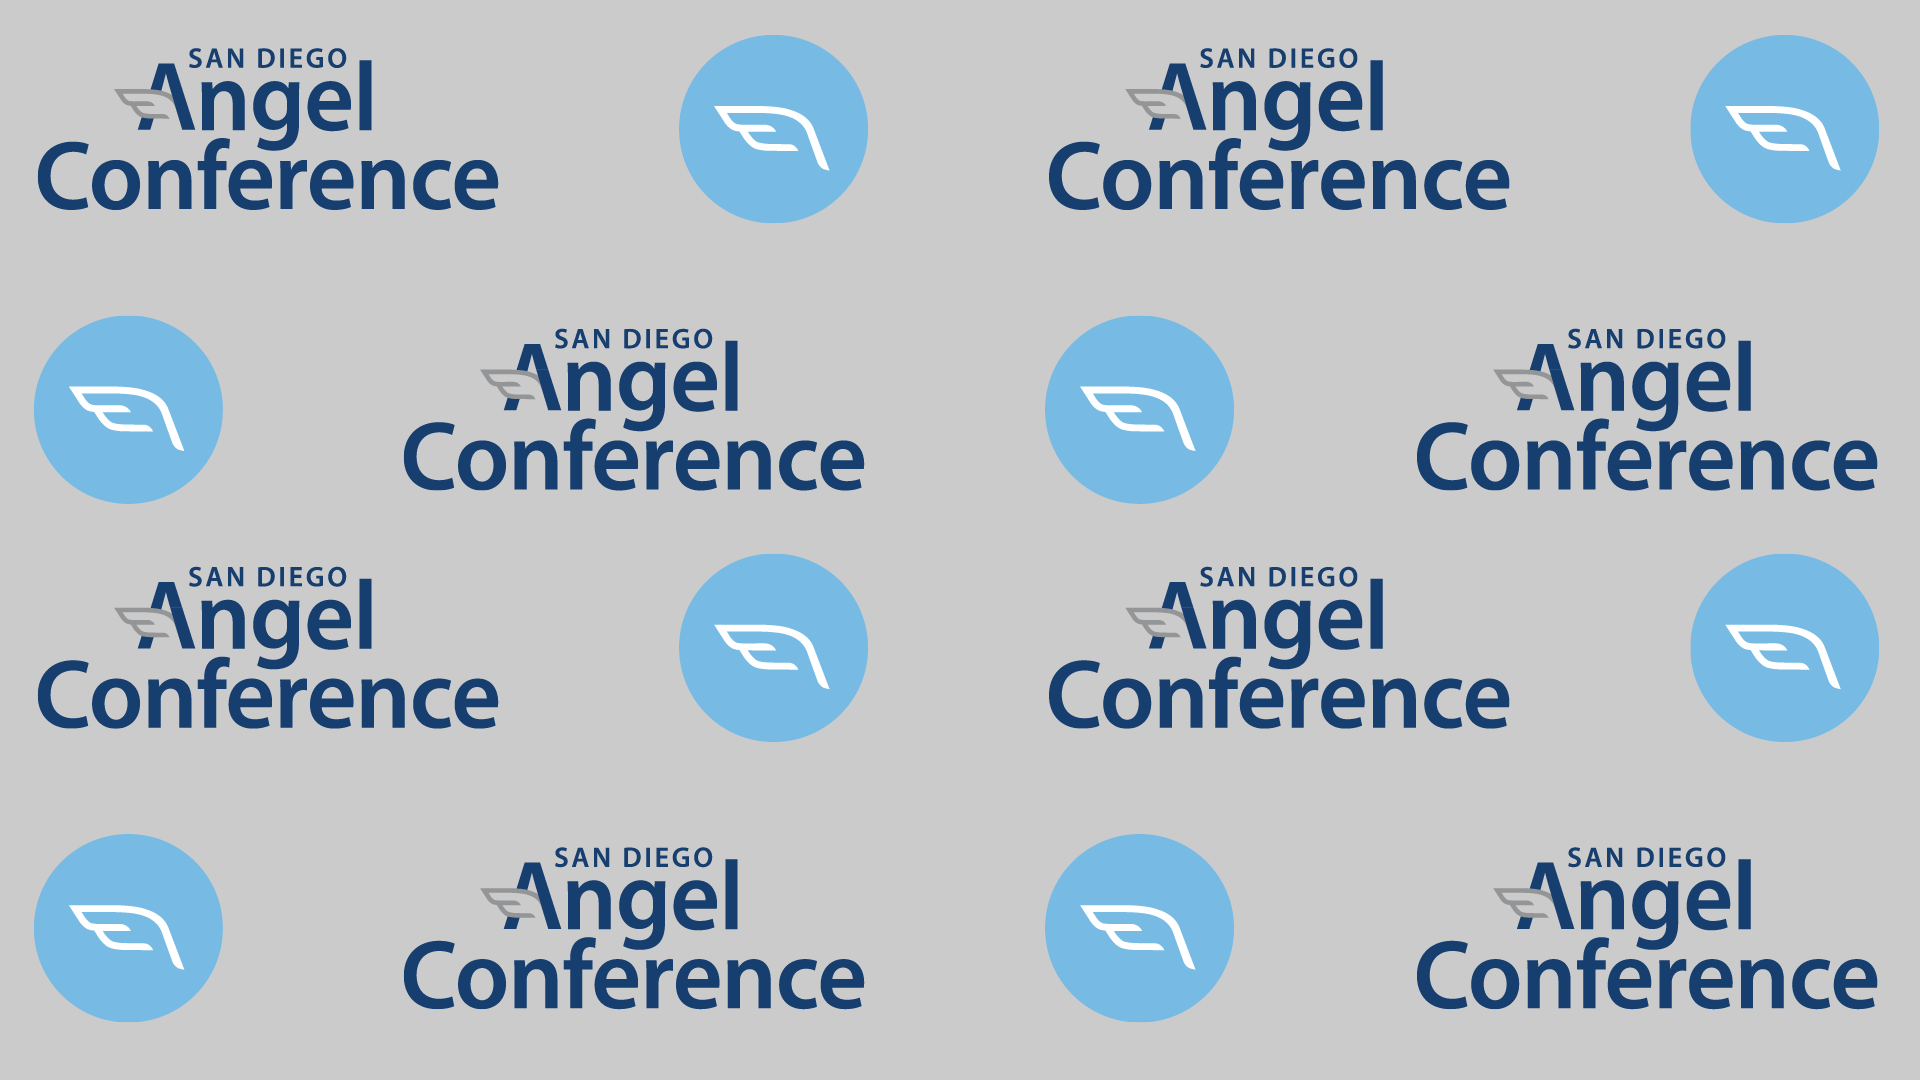 San Diego Angel Conference Logo